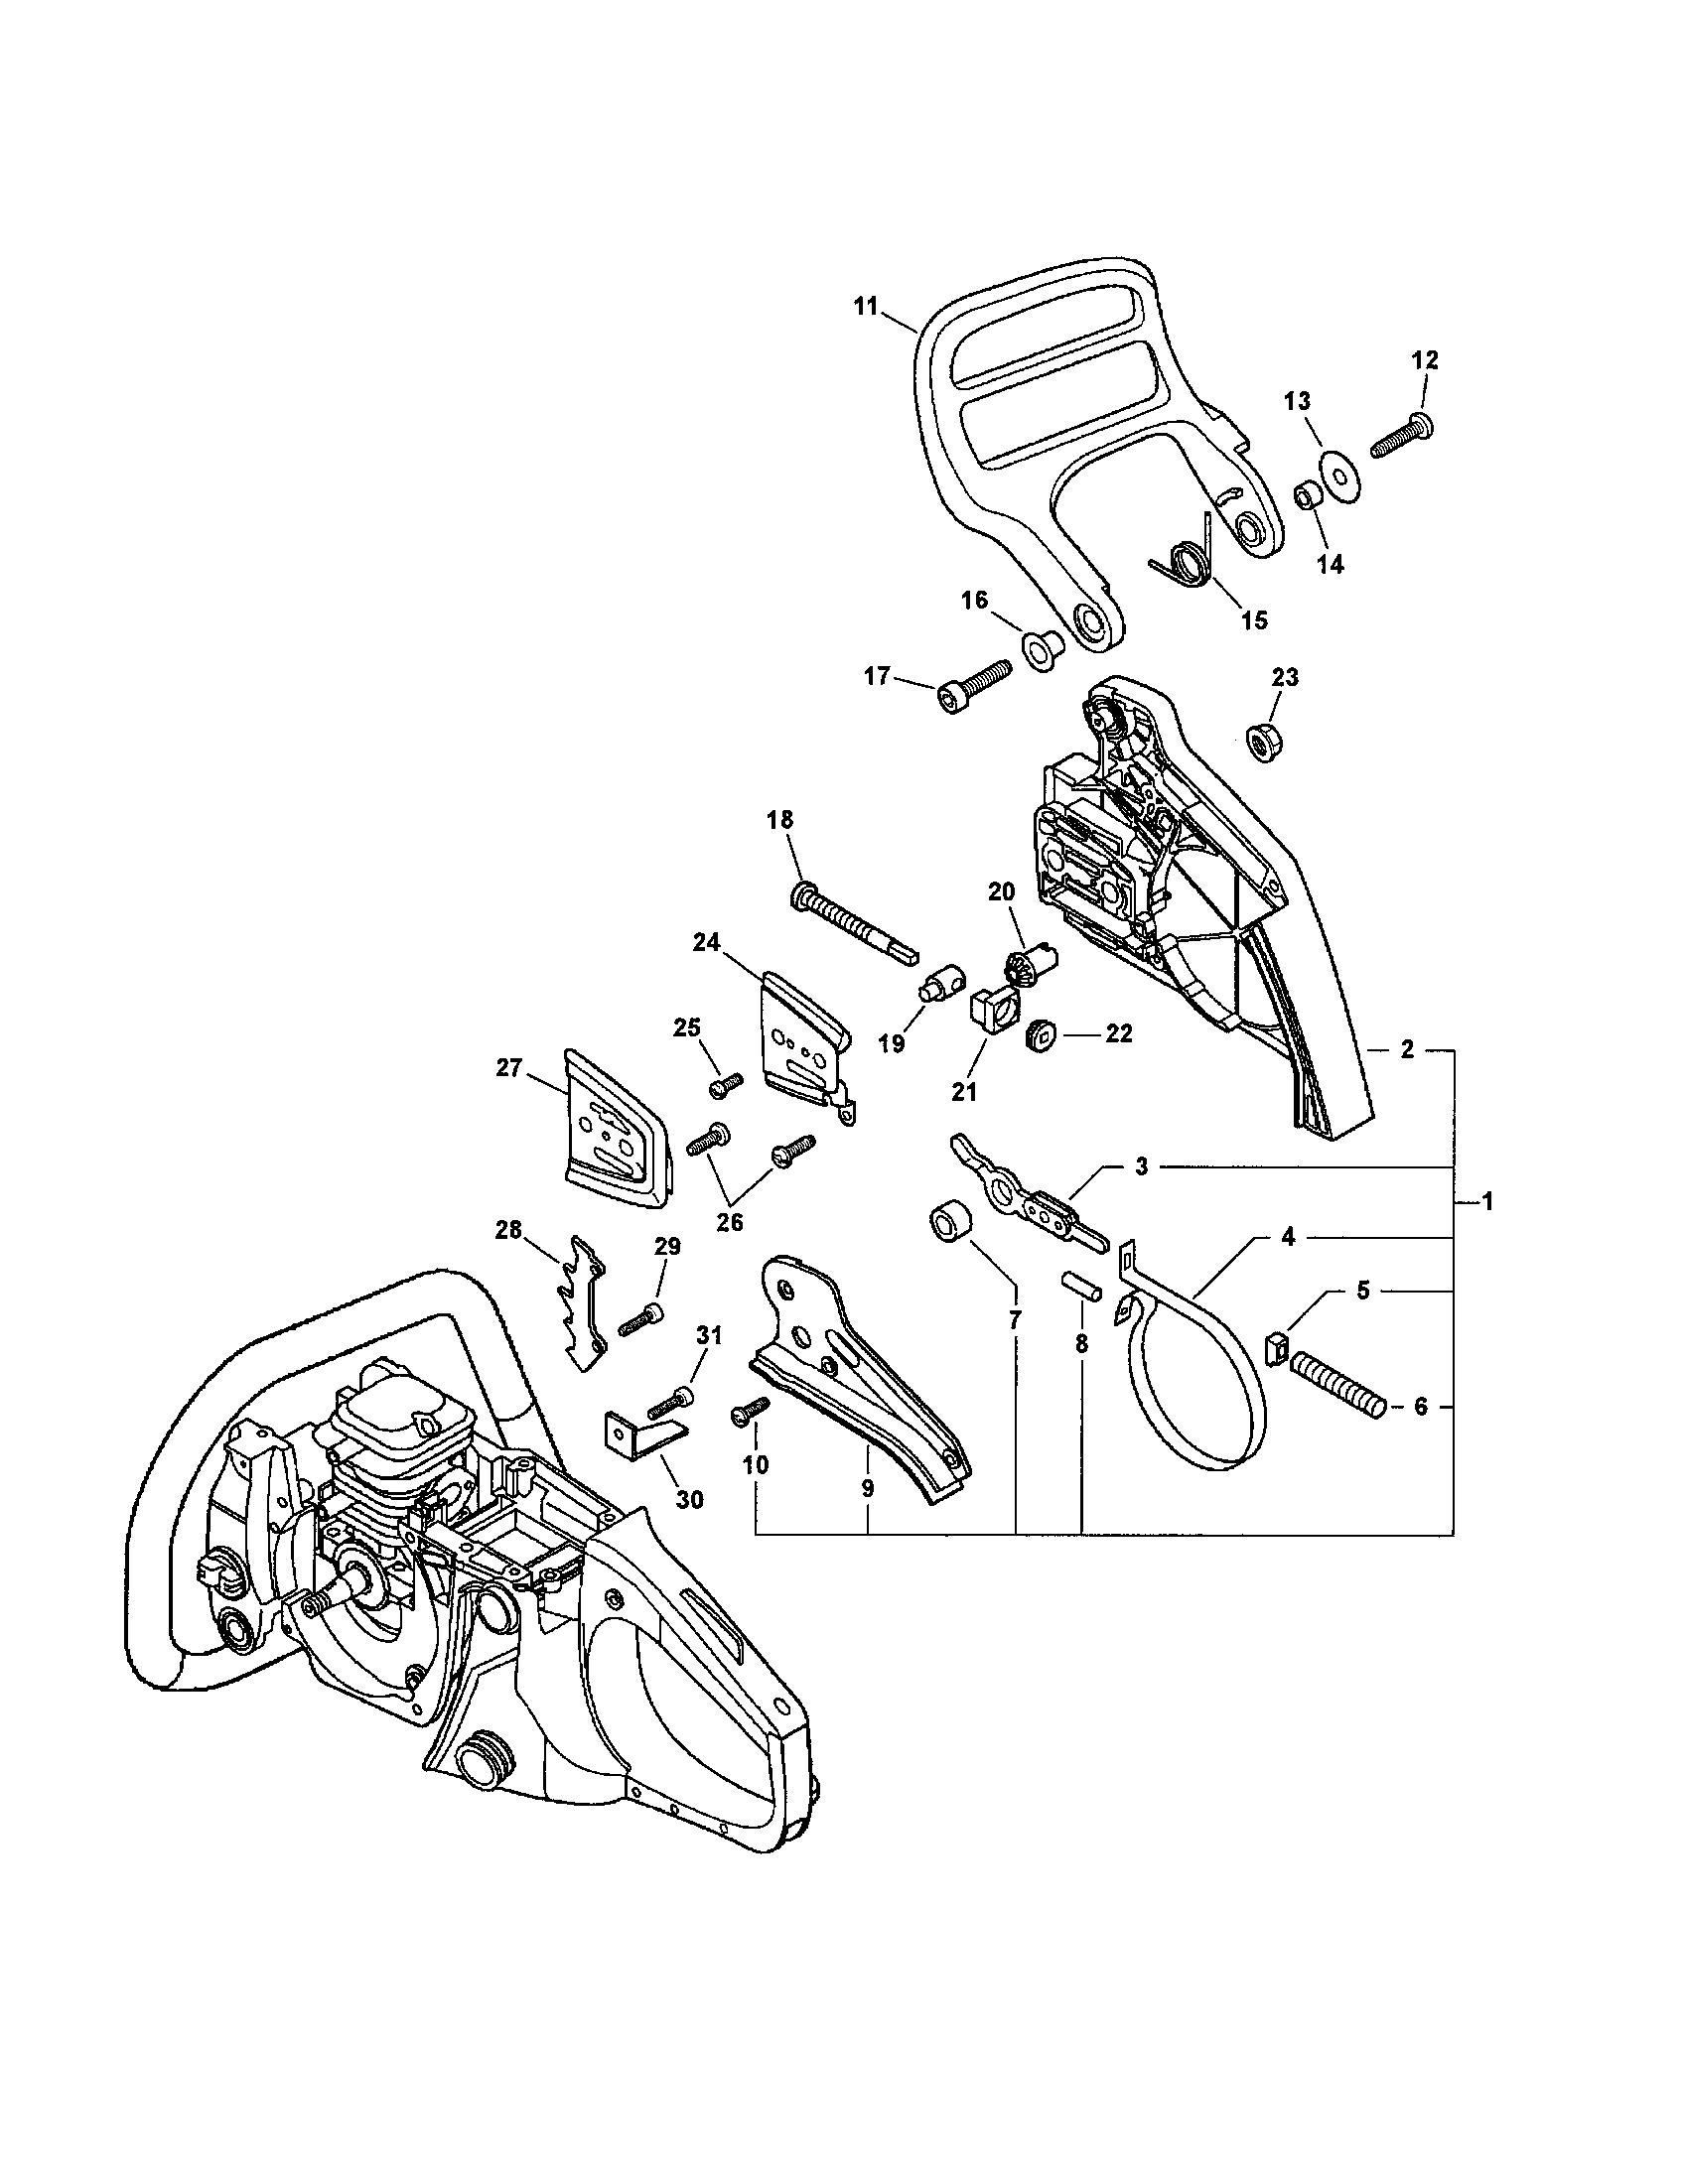 hight resolution of echo cs 400 chain brake diagram